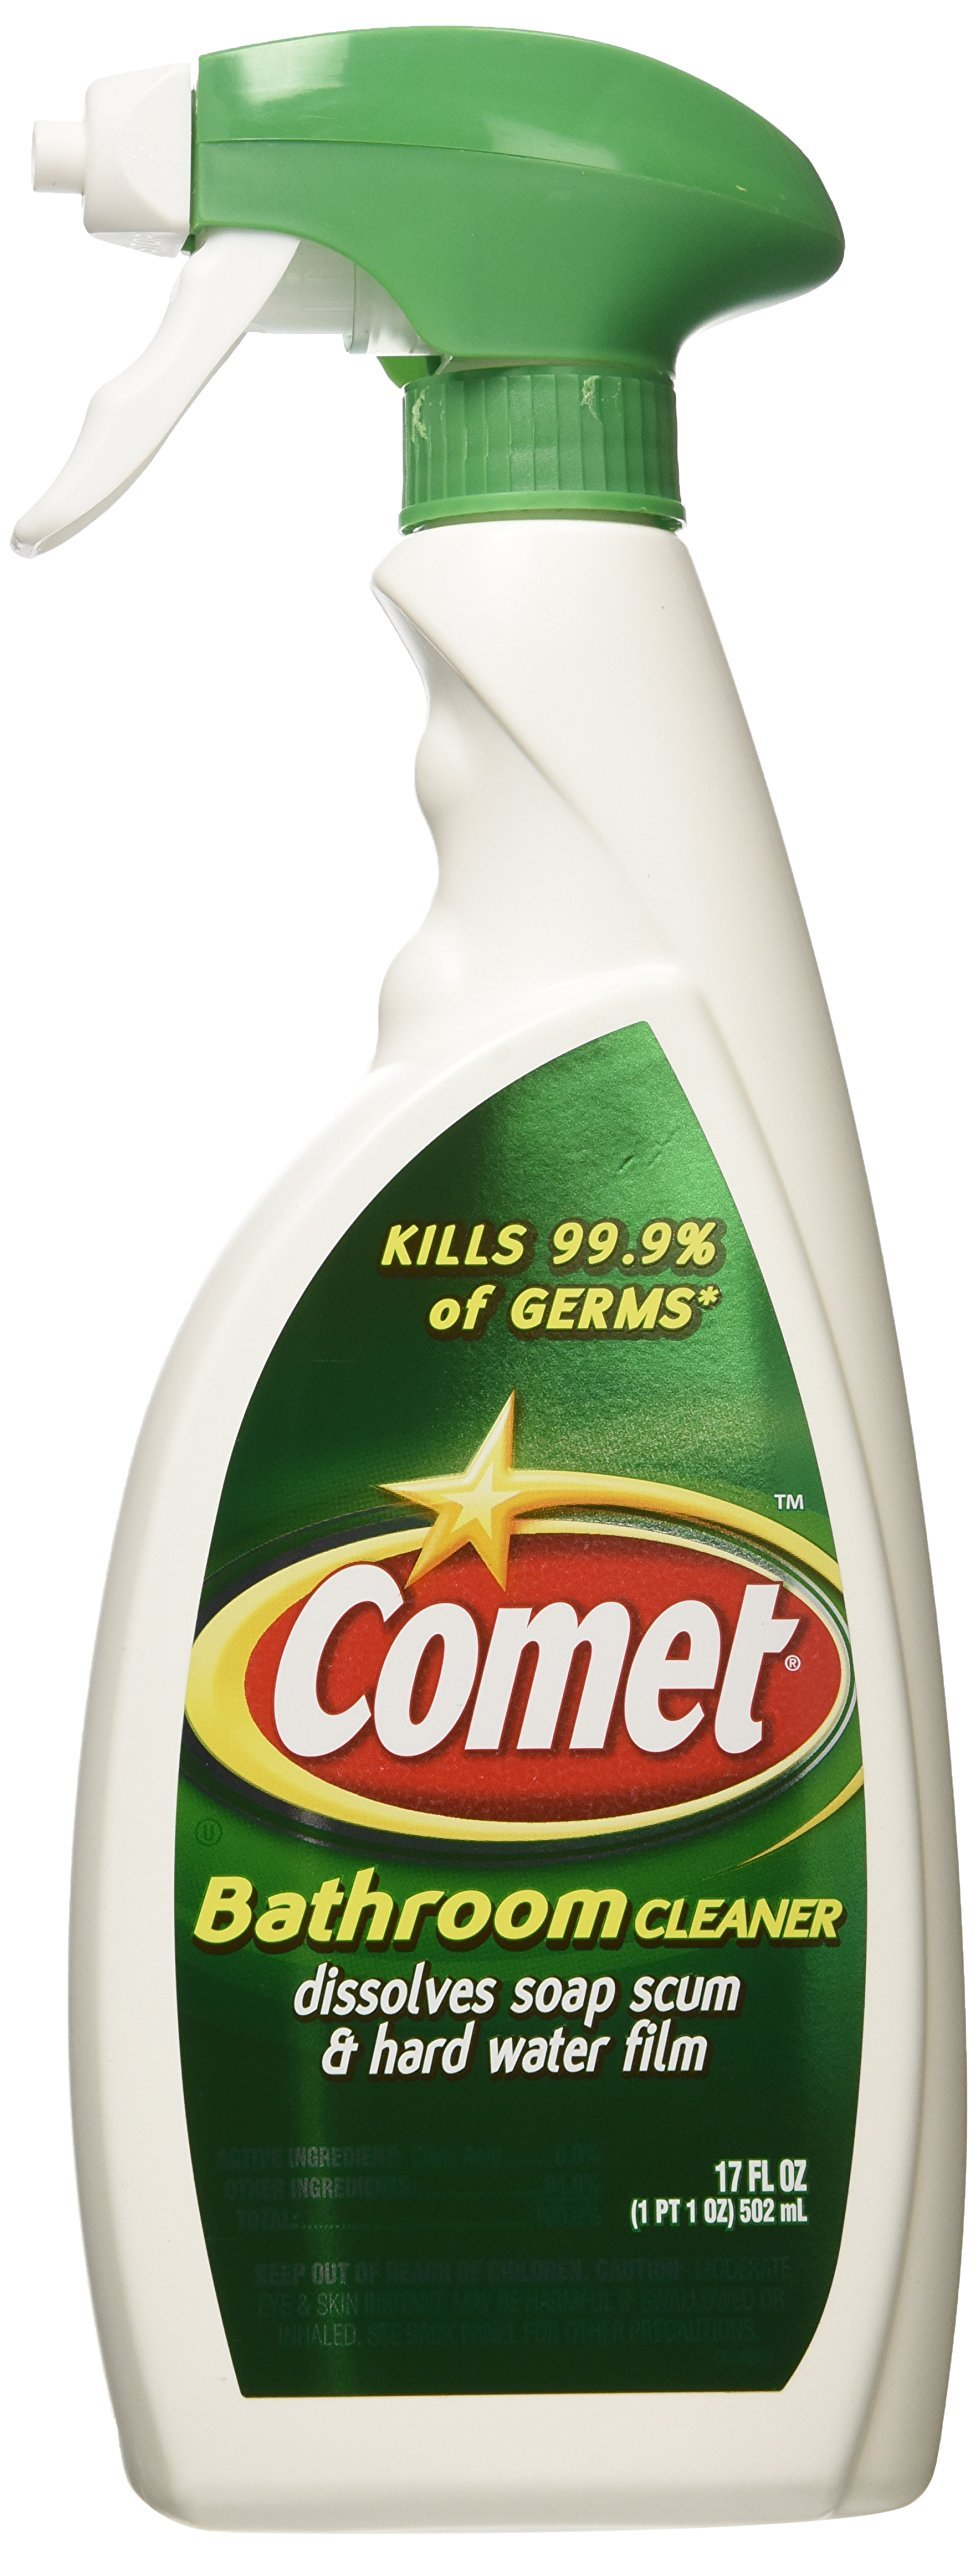 Comet Bathroom Cleaner 17oz by Comet (Image #1)